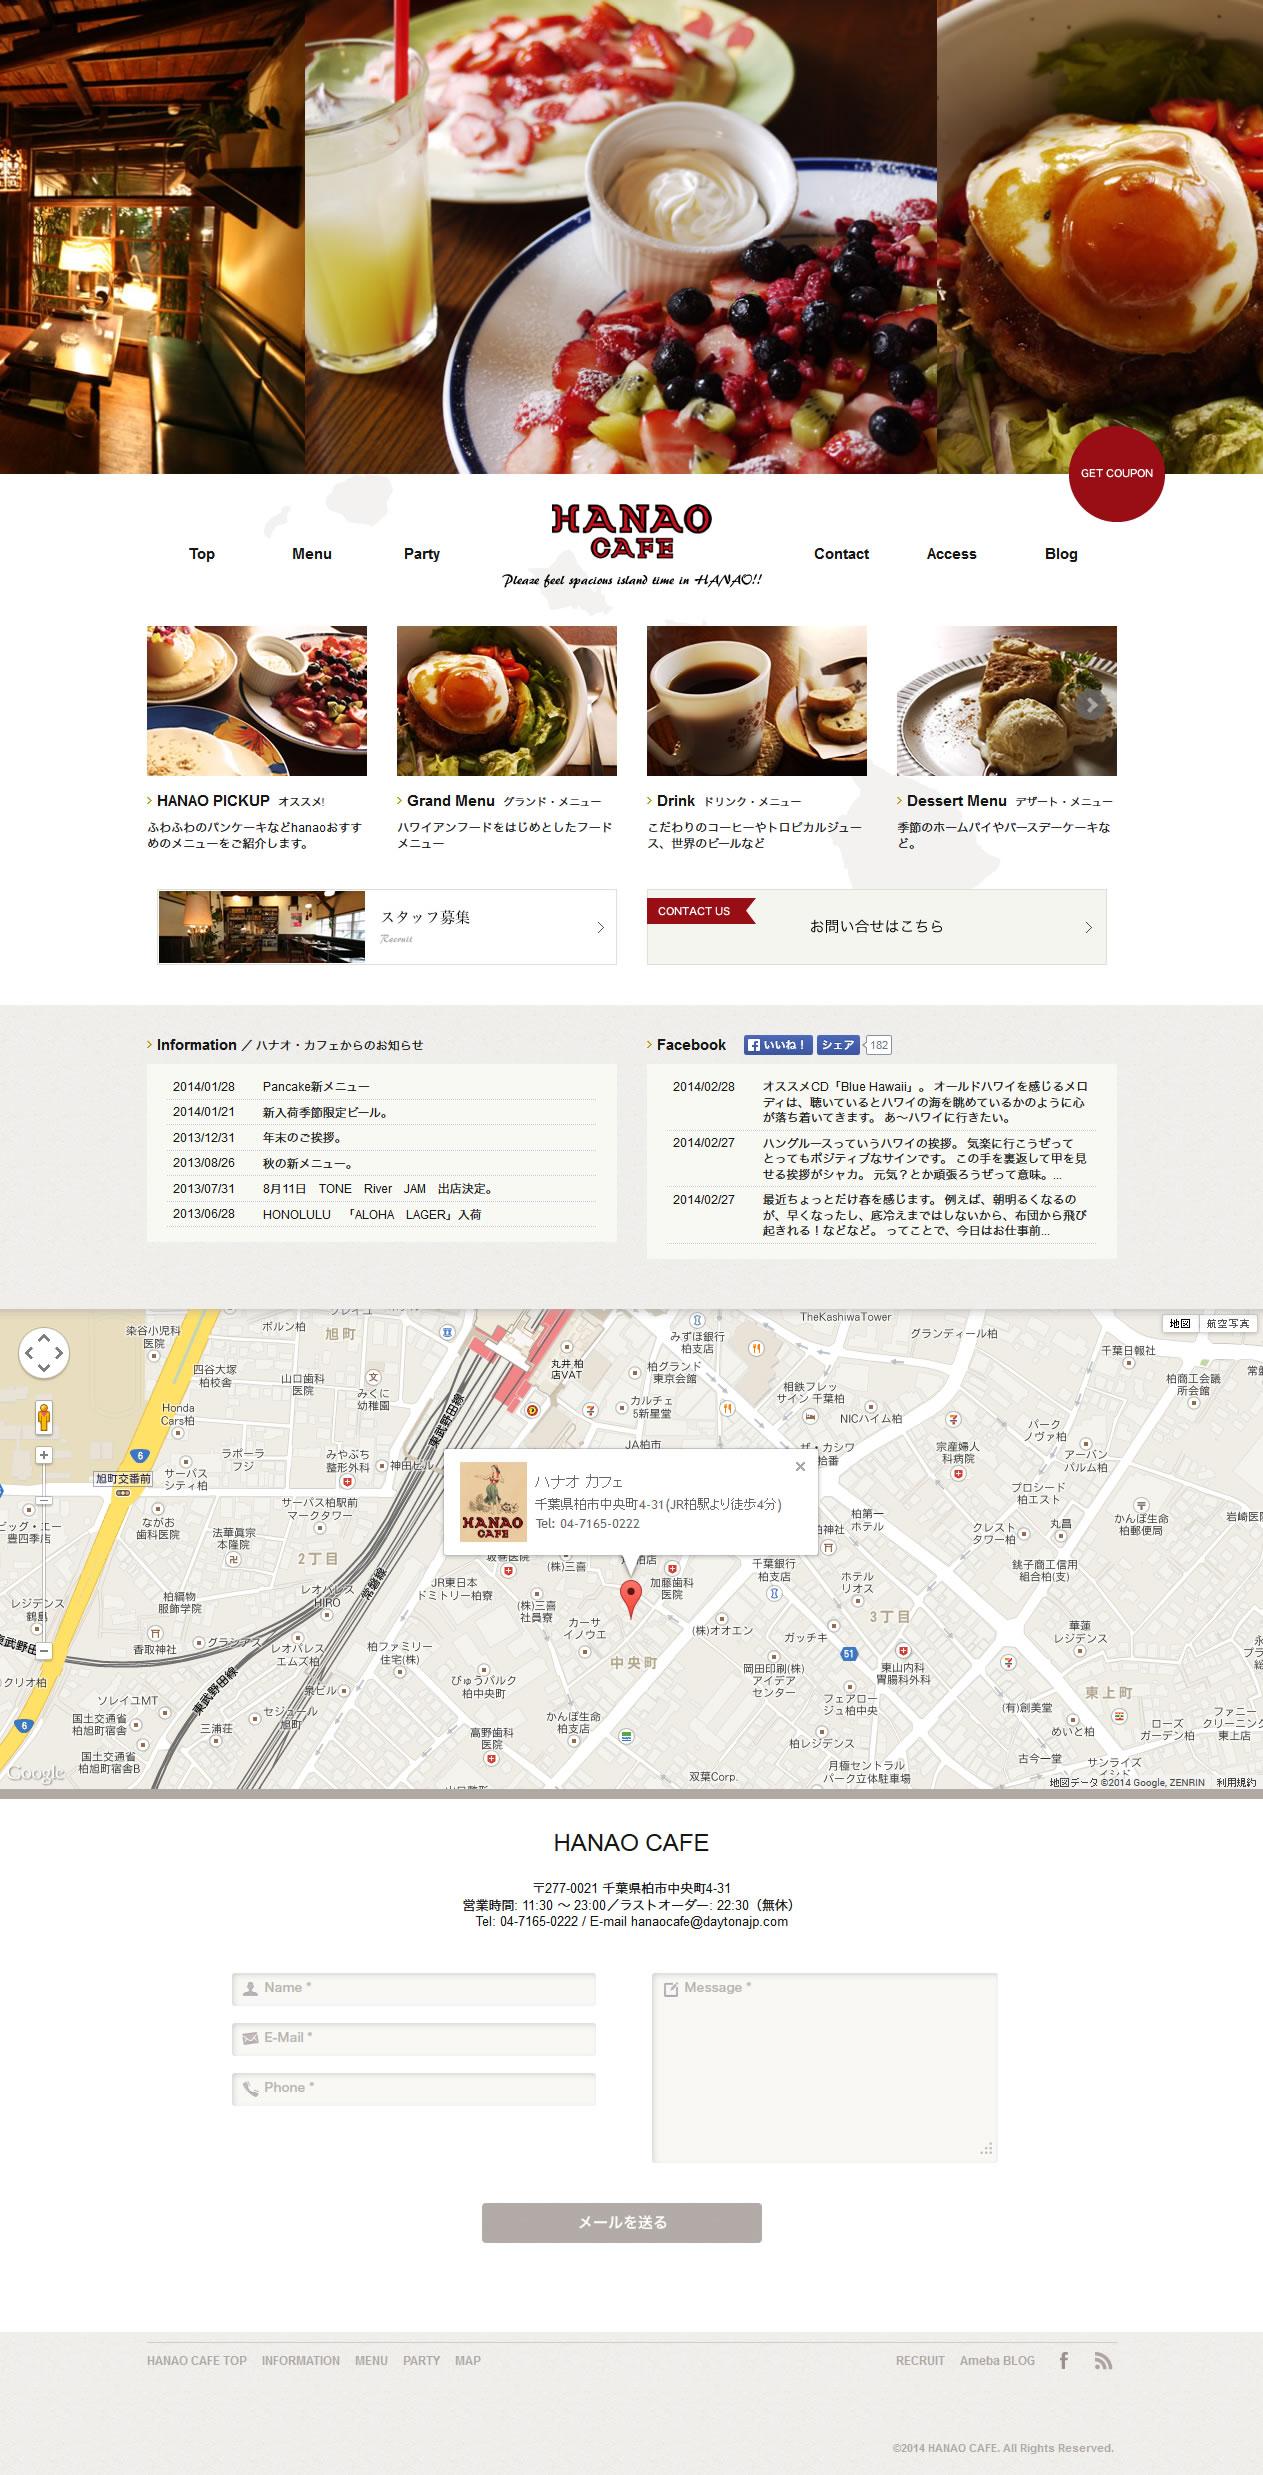 HANAO CAFE